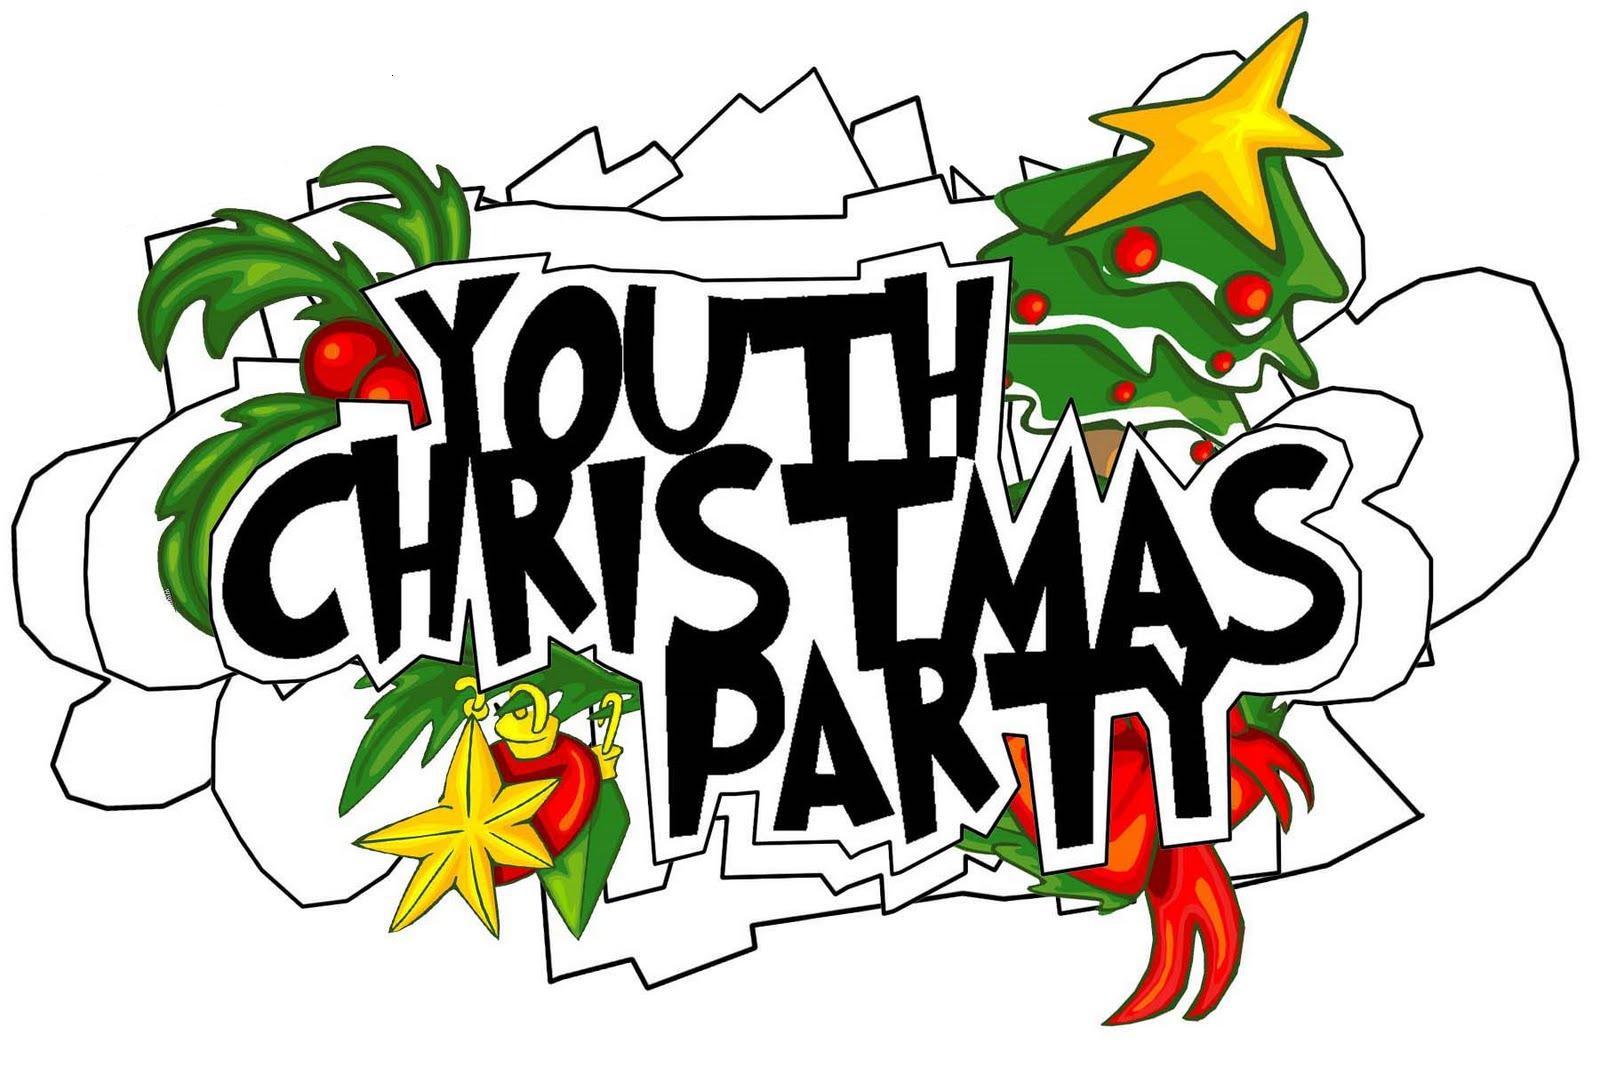 1600x1067 Church Clipart Christmas Party